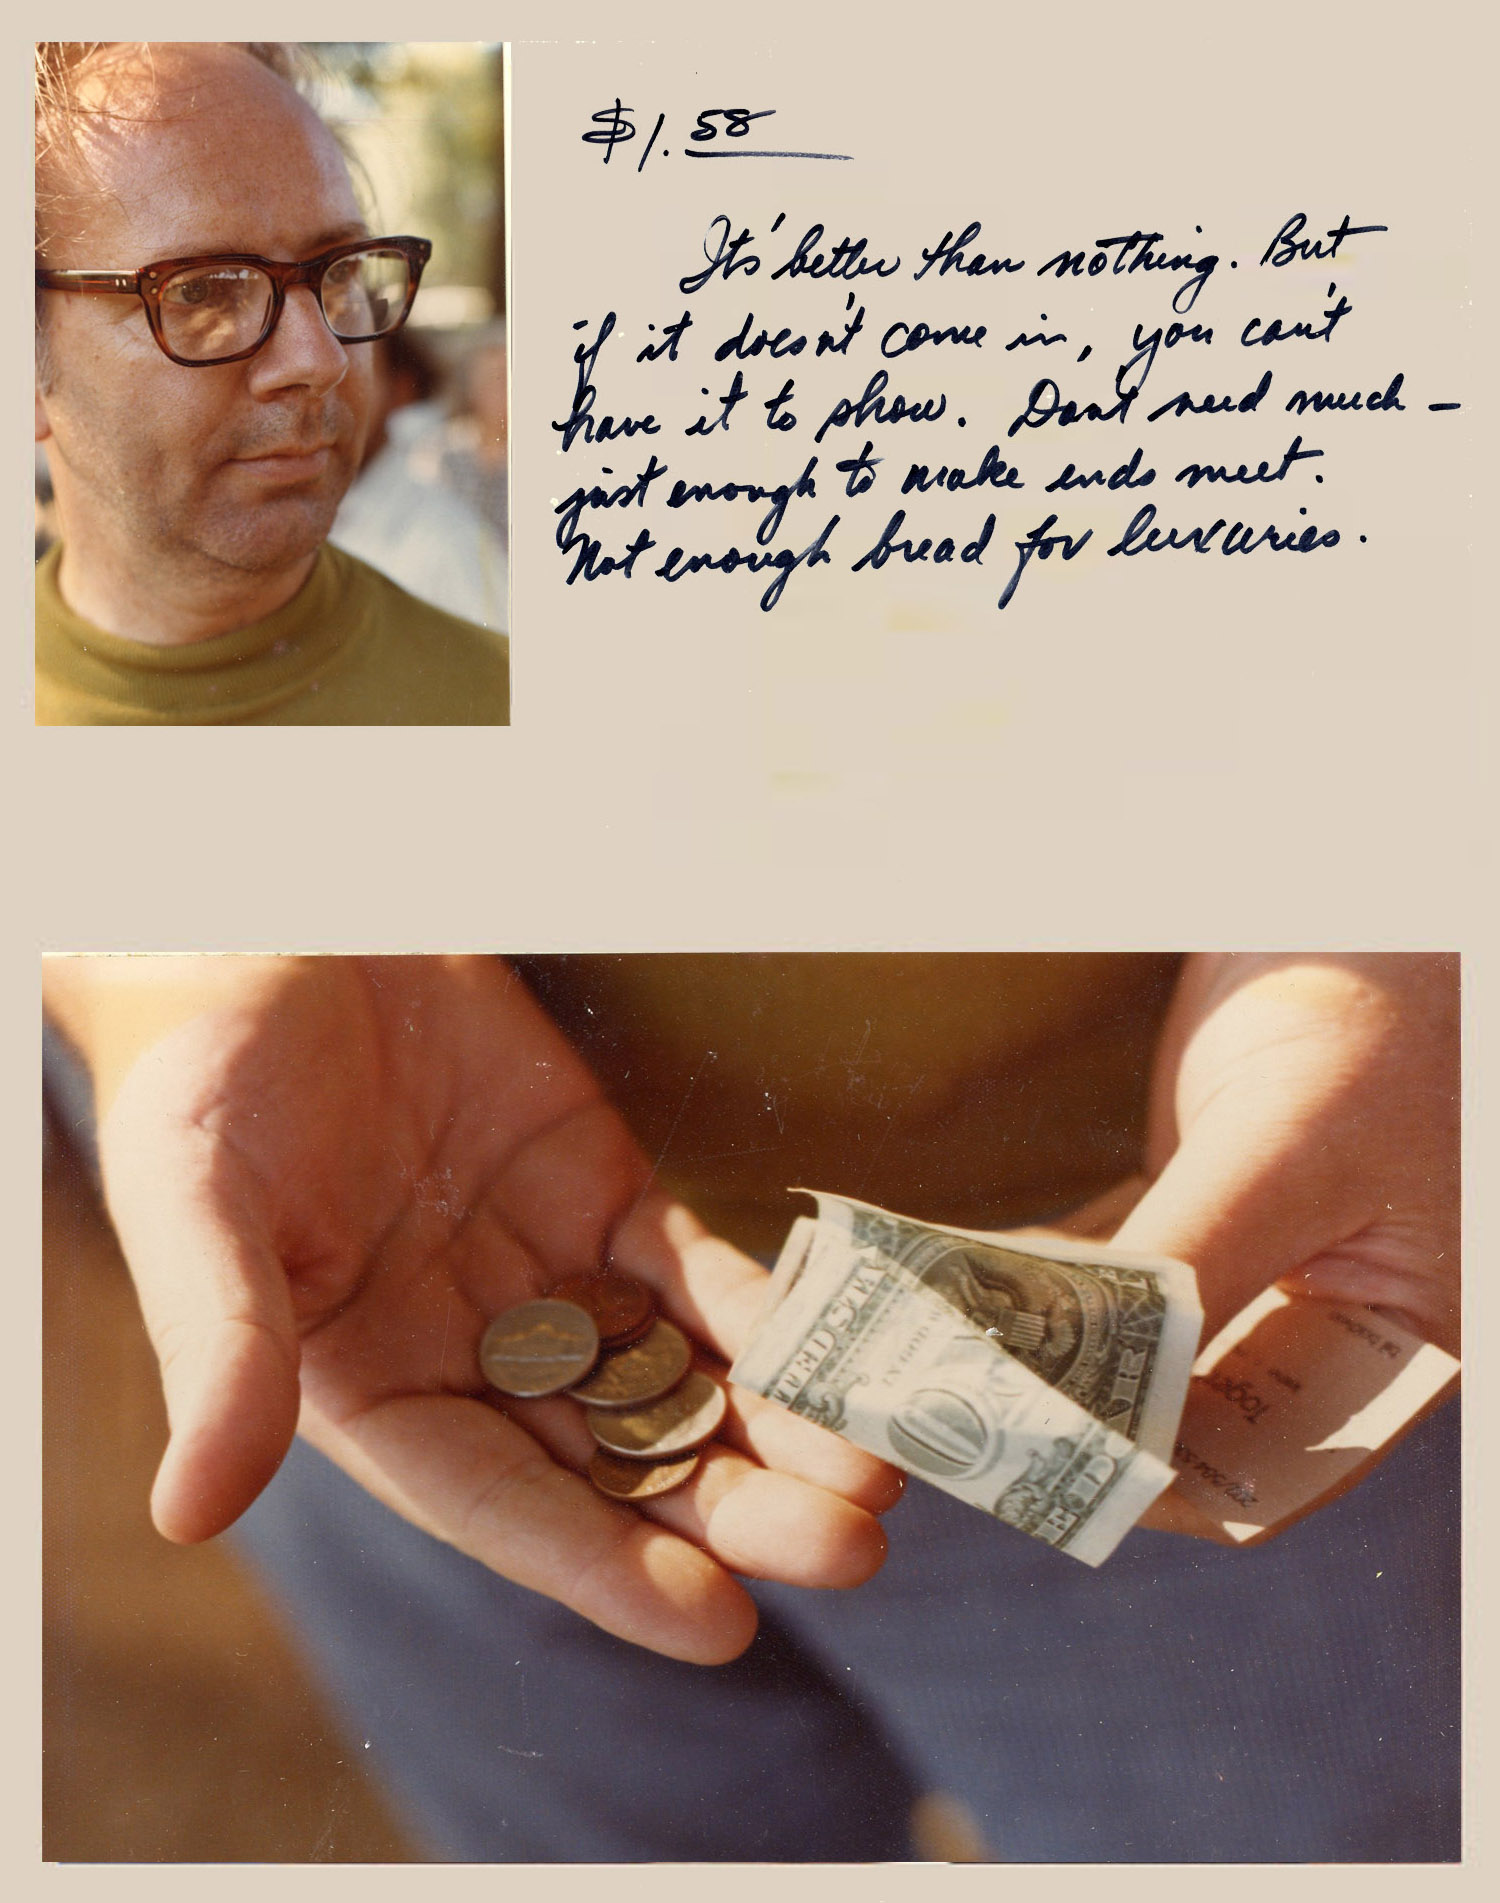 money-redesign-6 copy.jpg